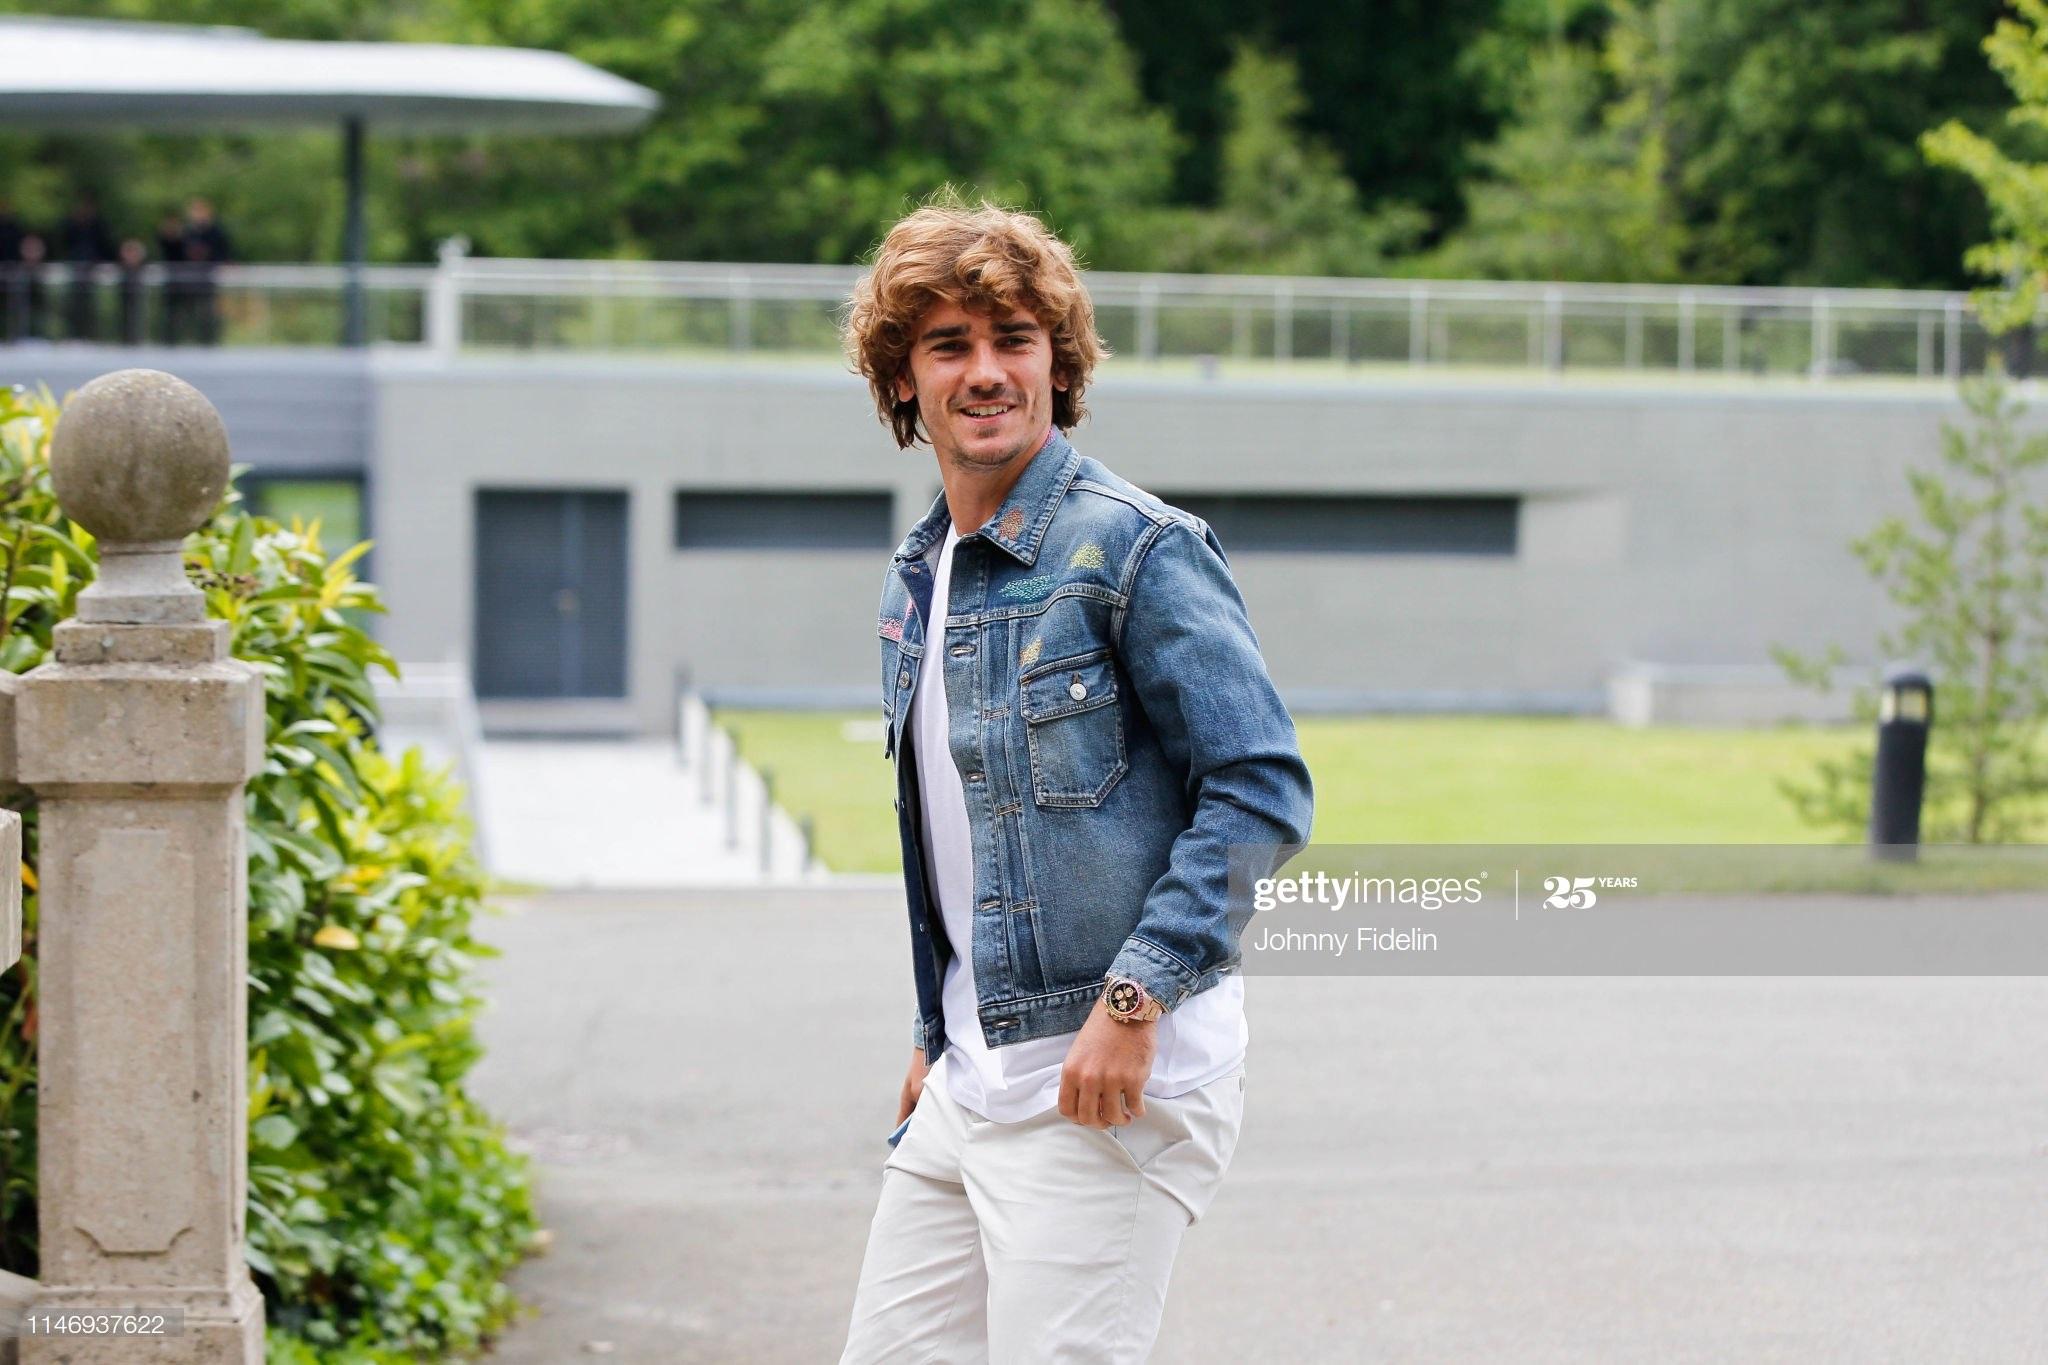 Rolex daytona spotted - Antoine Griezmann 1